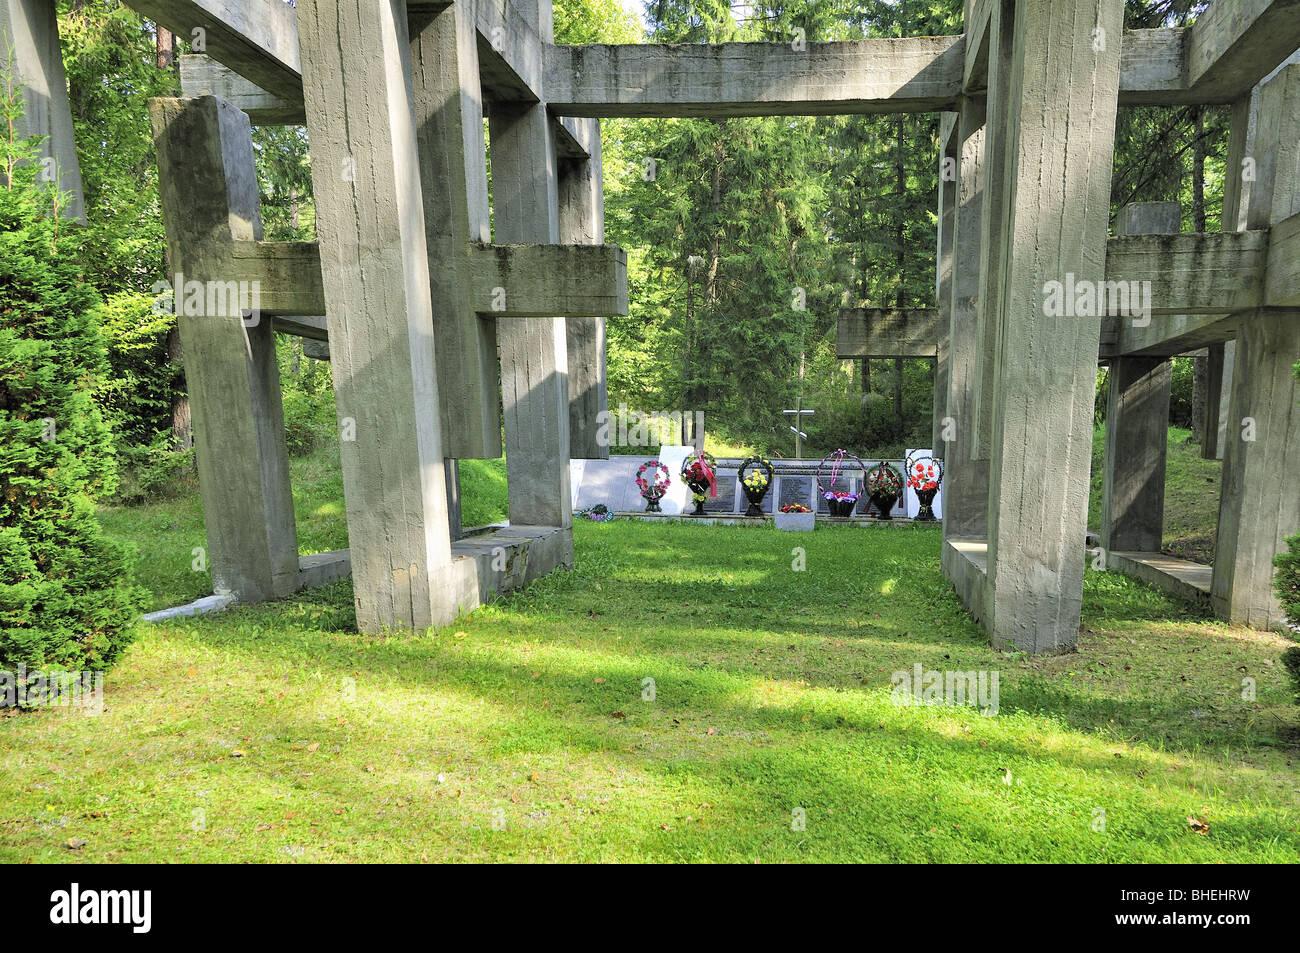 monument to victims of World War II in woodland national park Belovezhskaya Pushcha, Belarus Stock Photo